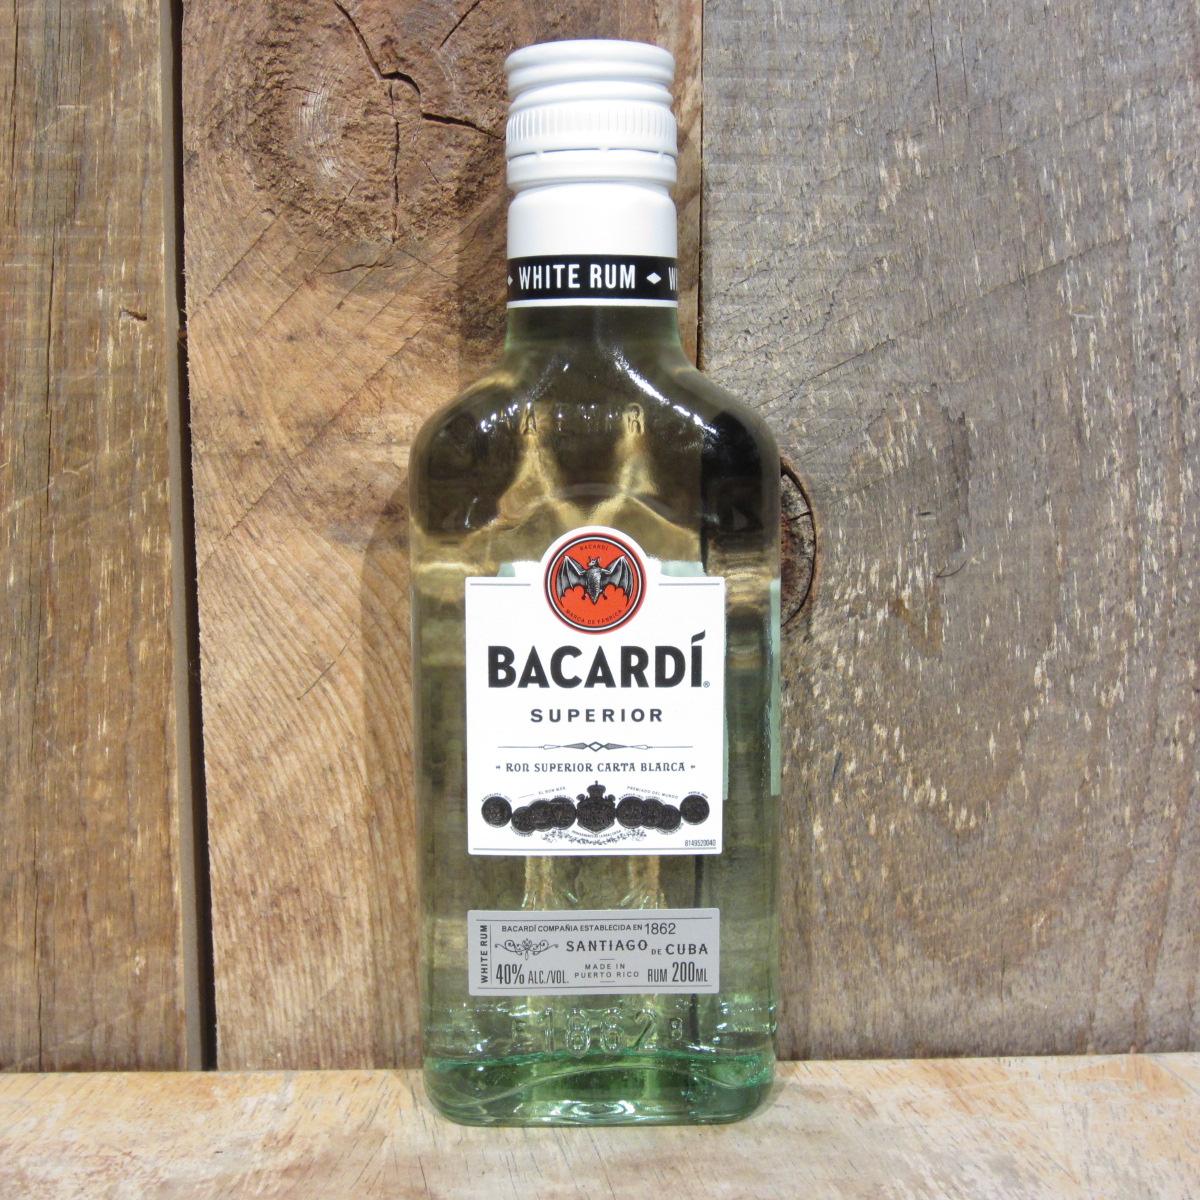 Bacardi Superior 200ml (Half Pint)